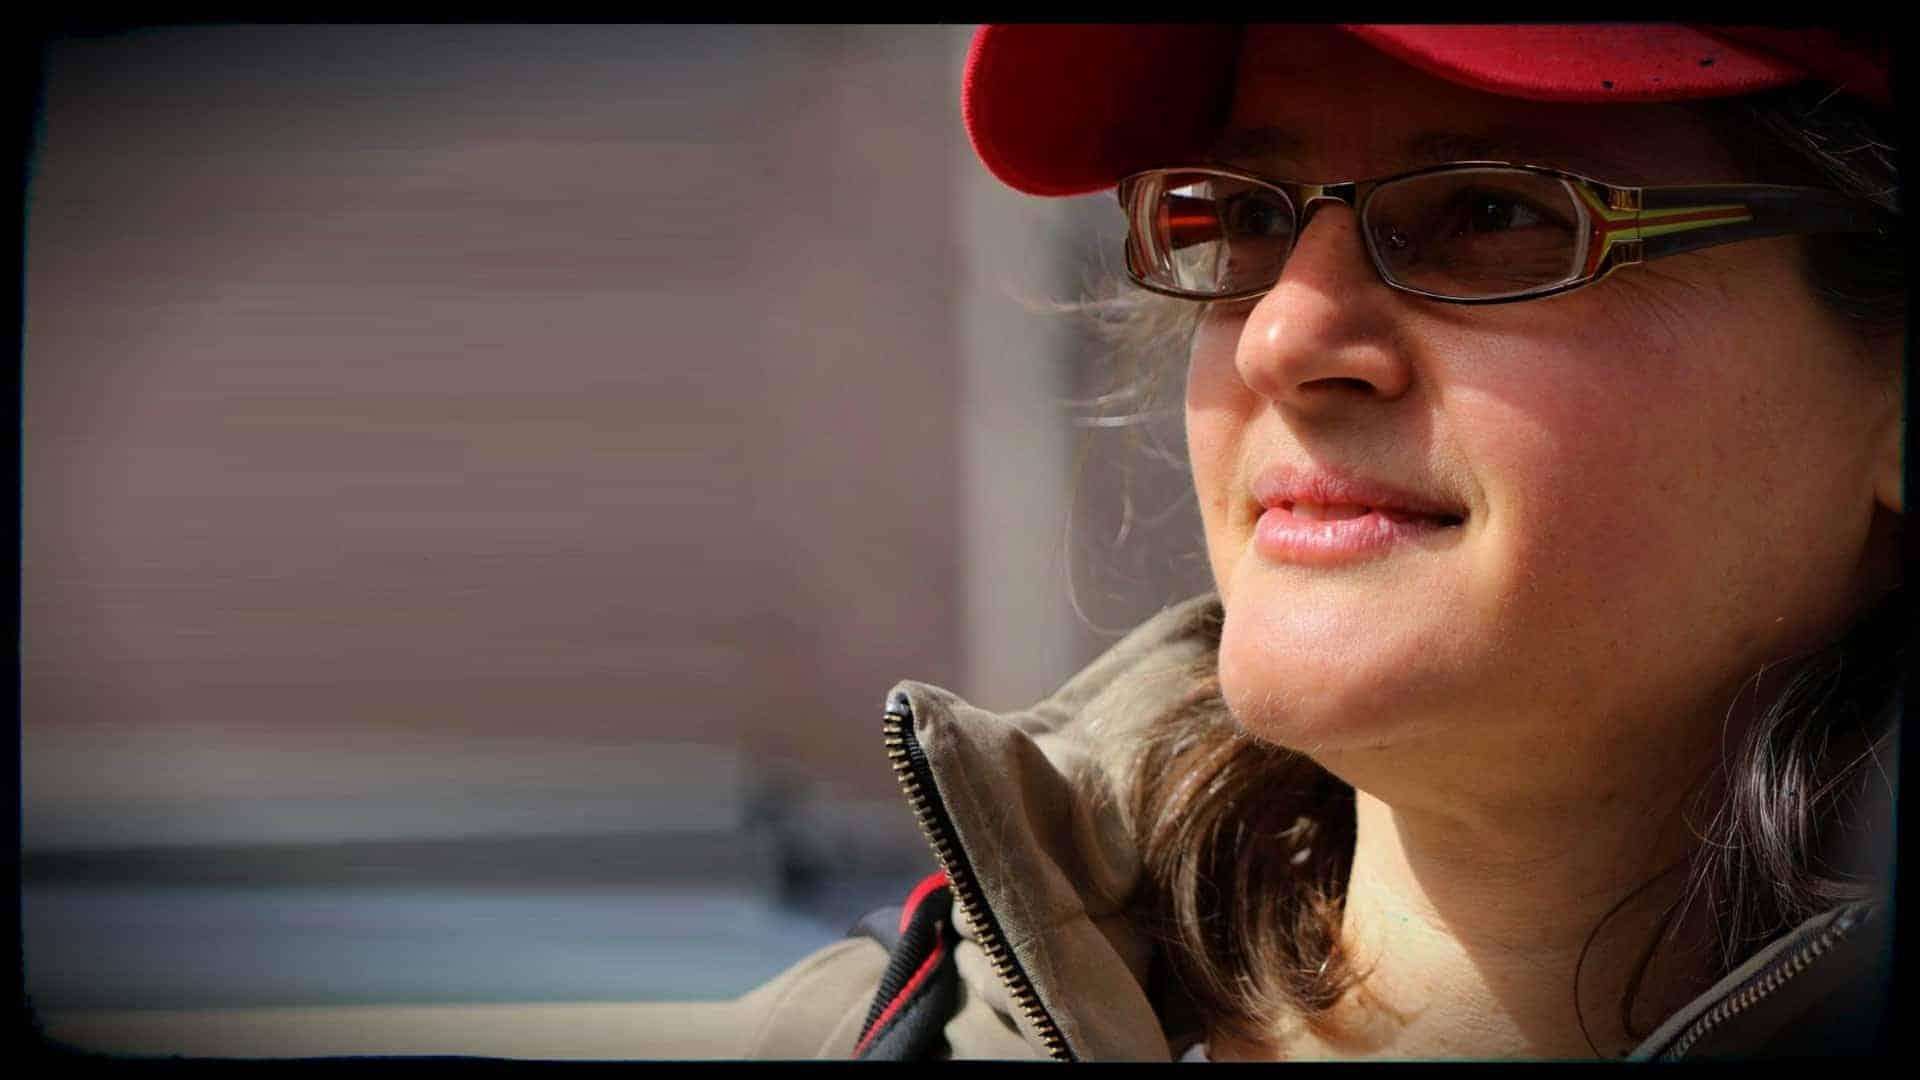 Anita Krajnc Co-Founder Toronto Pig Save is shown in three quarter profile.